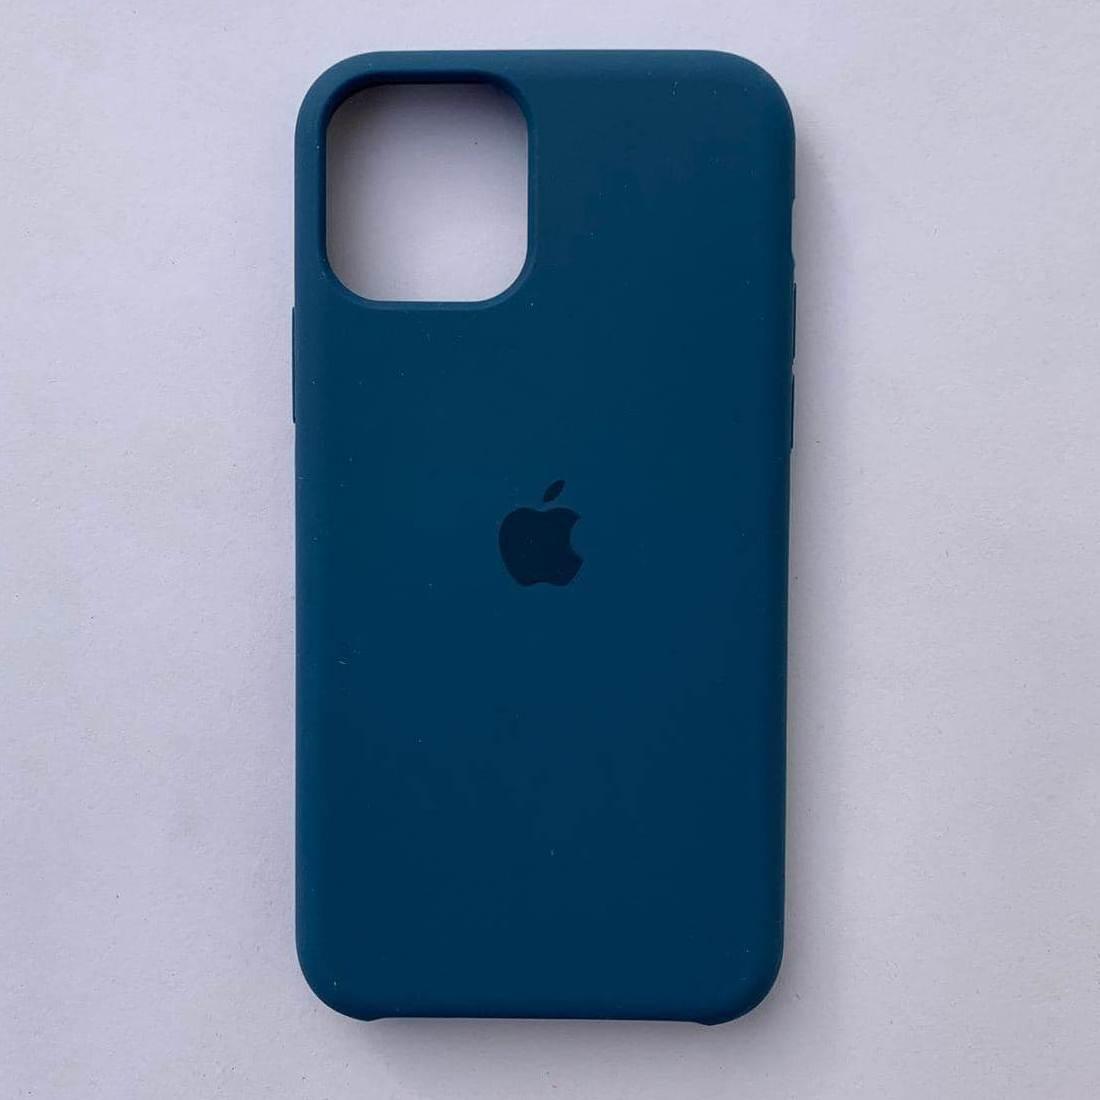 Чехол Silicone Case для Apple iPhone 11 Pro Max Ocean Blue